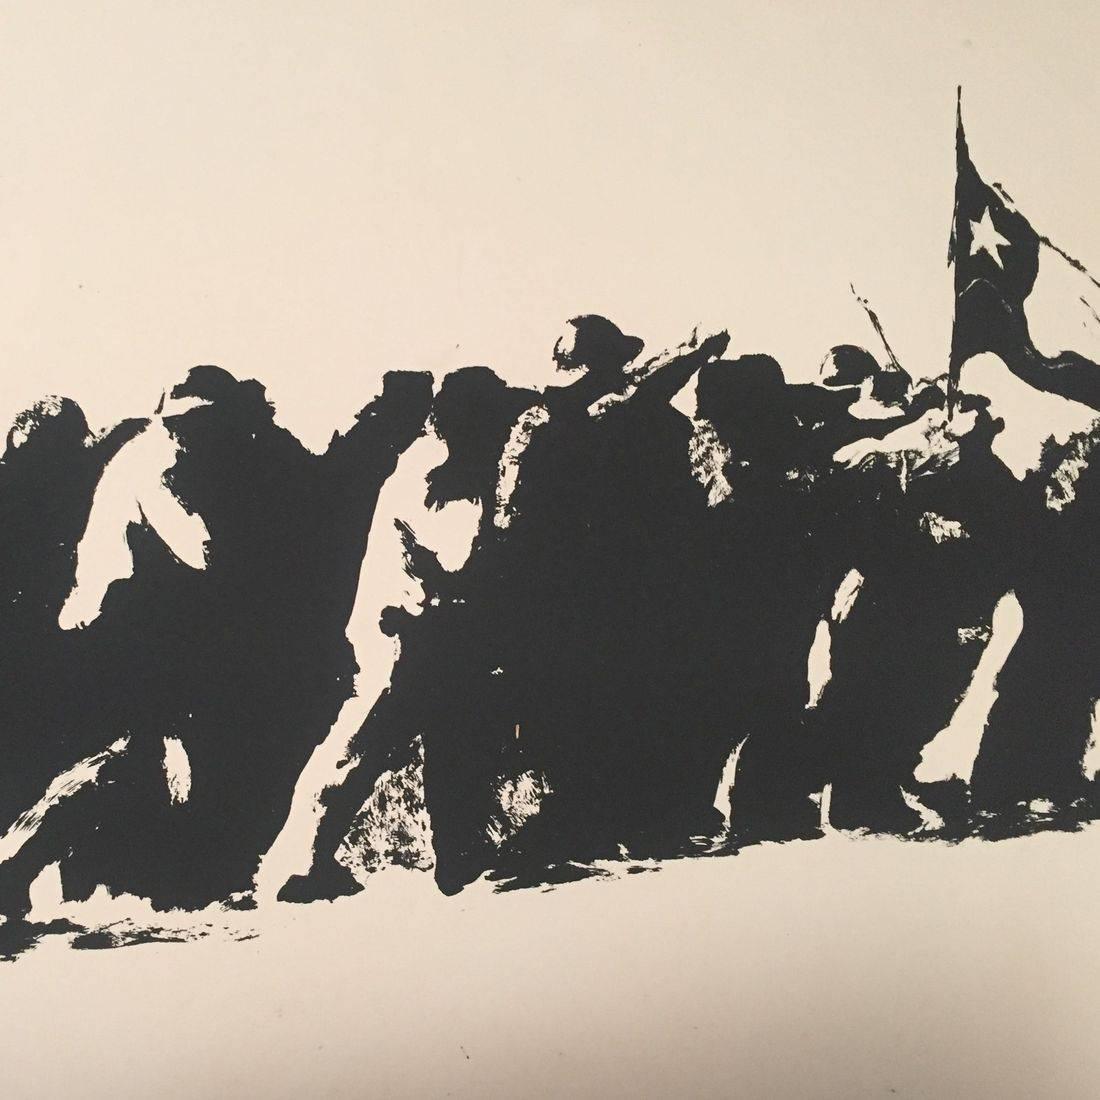 Jose Balmes, Camino de victoria, Paris 1977,  print, #40/60